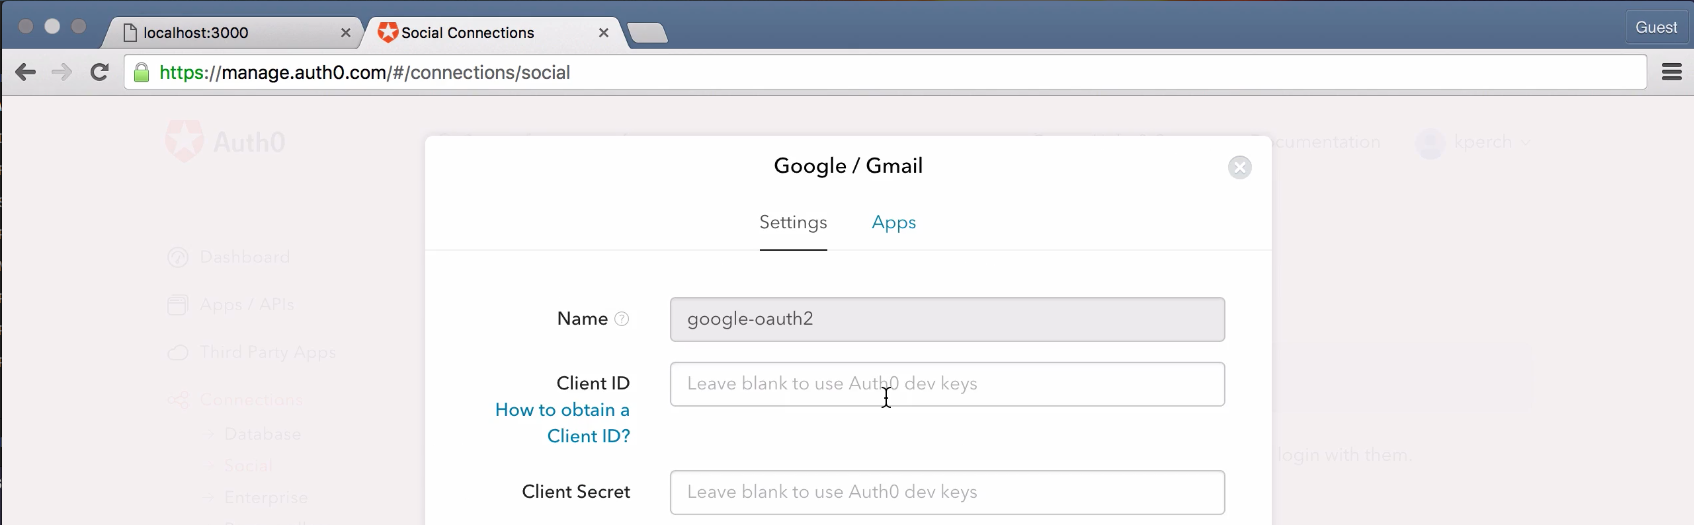 Google connection configureation window